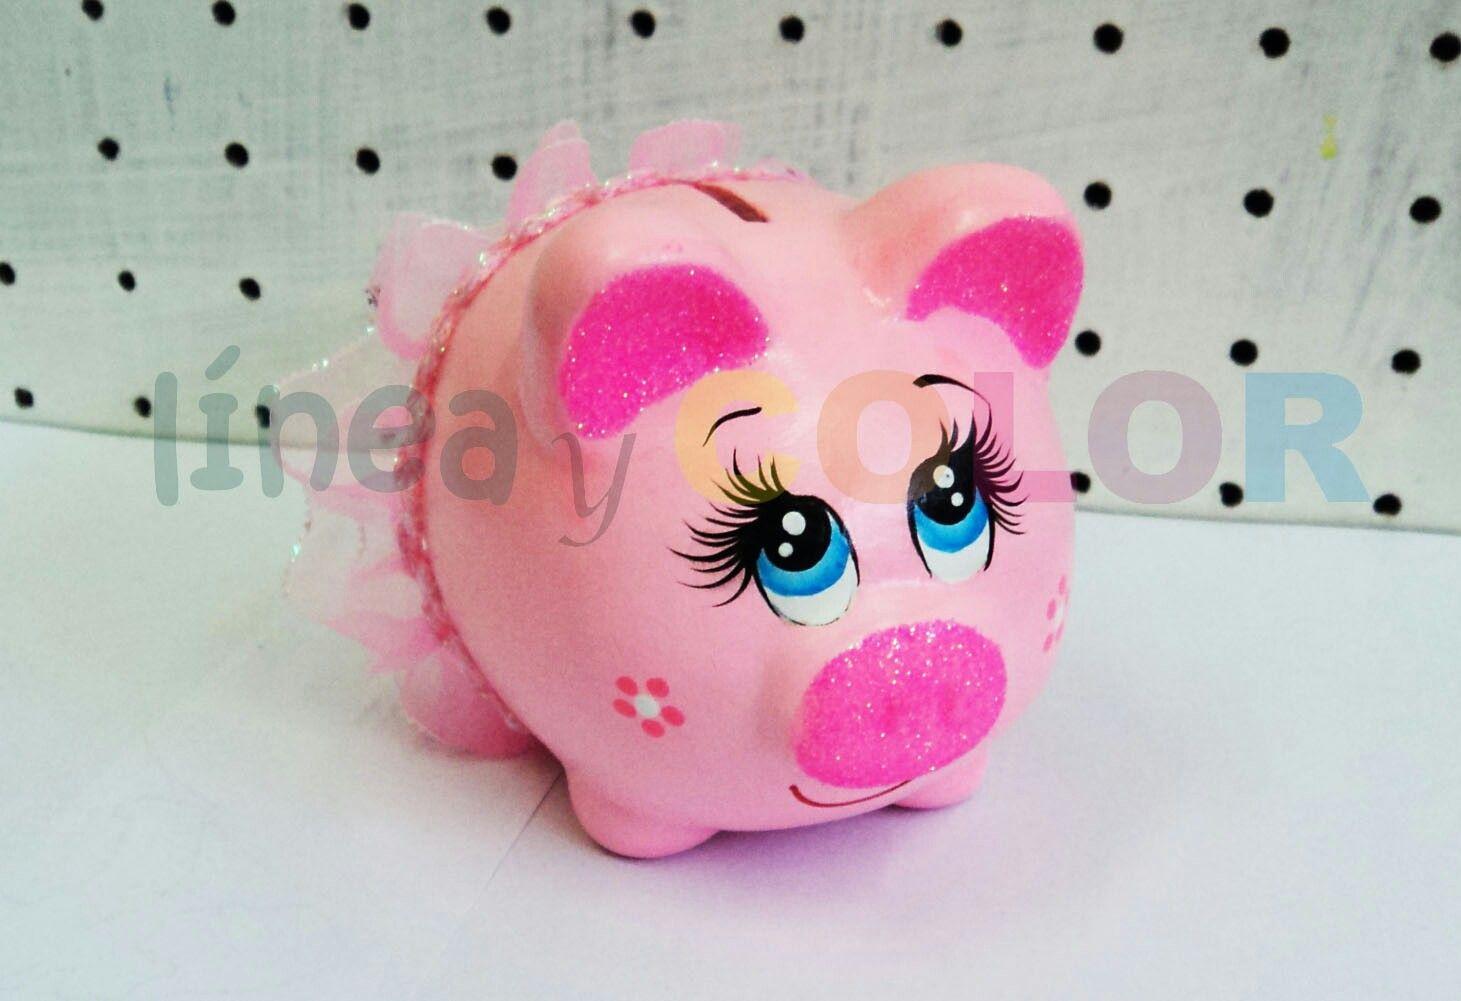 Pin by leidy gonzalez on alcancias | Pinterest | Piggy banks, Pig ...